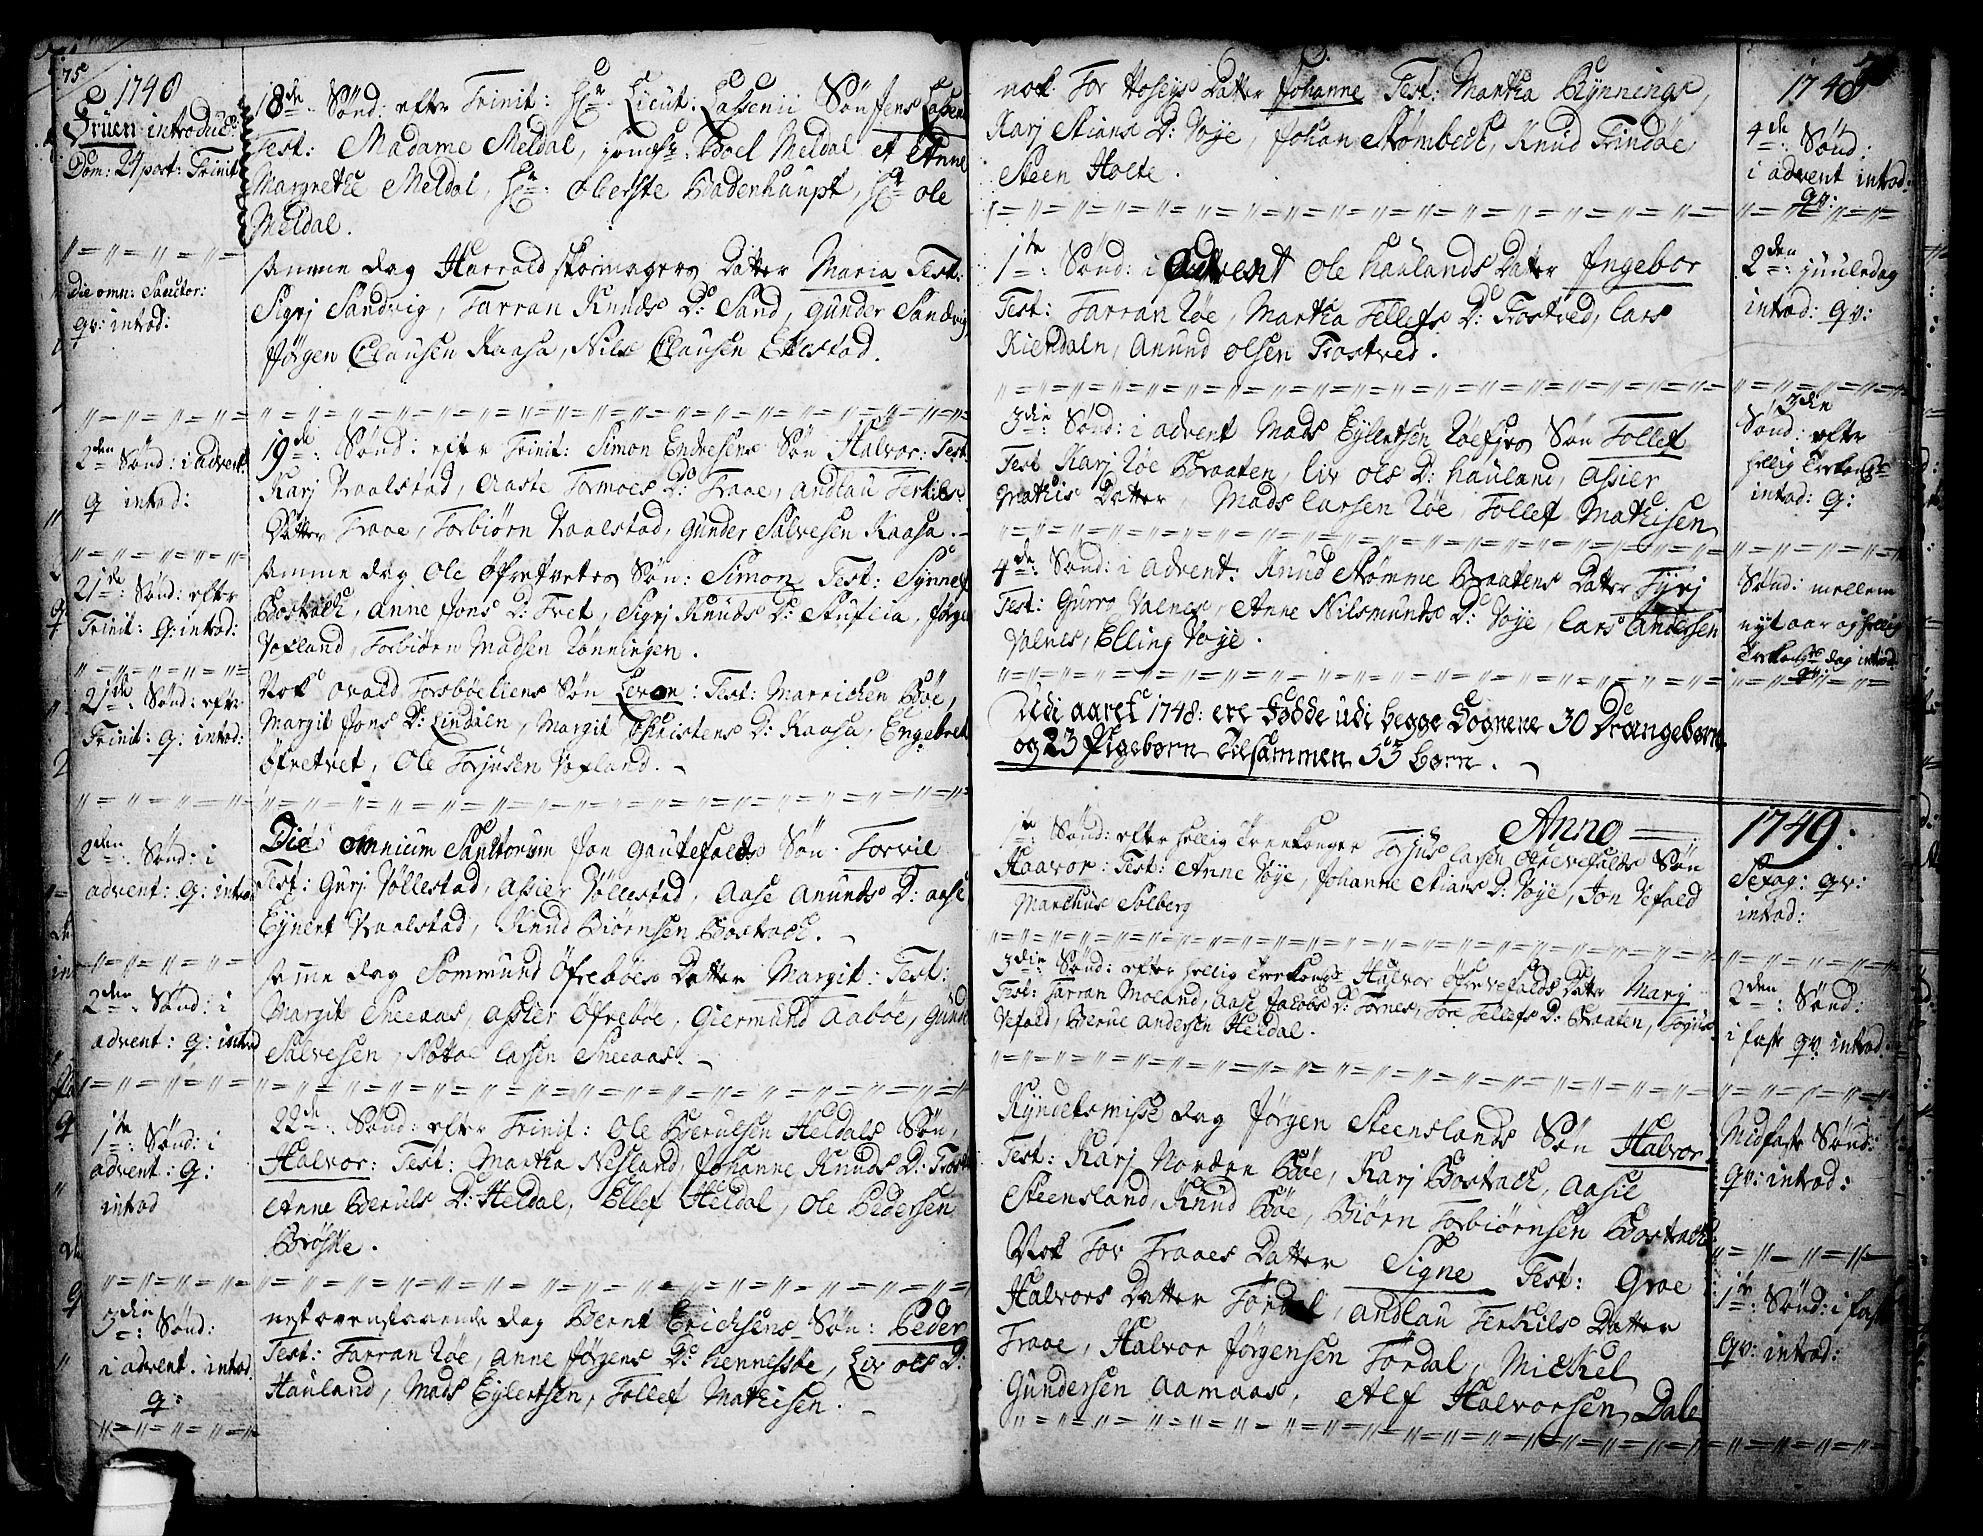 SAKO, Drangedal kirkebøker, F/Fa/L0002: Ministerialbok nr. 2, 1733-1753, s. 75-76